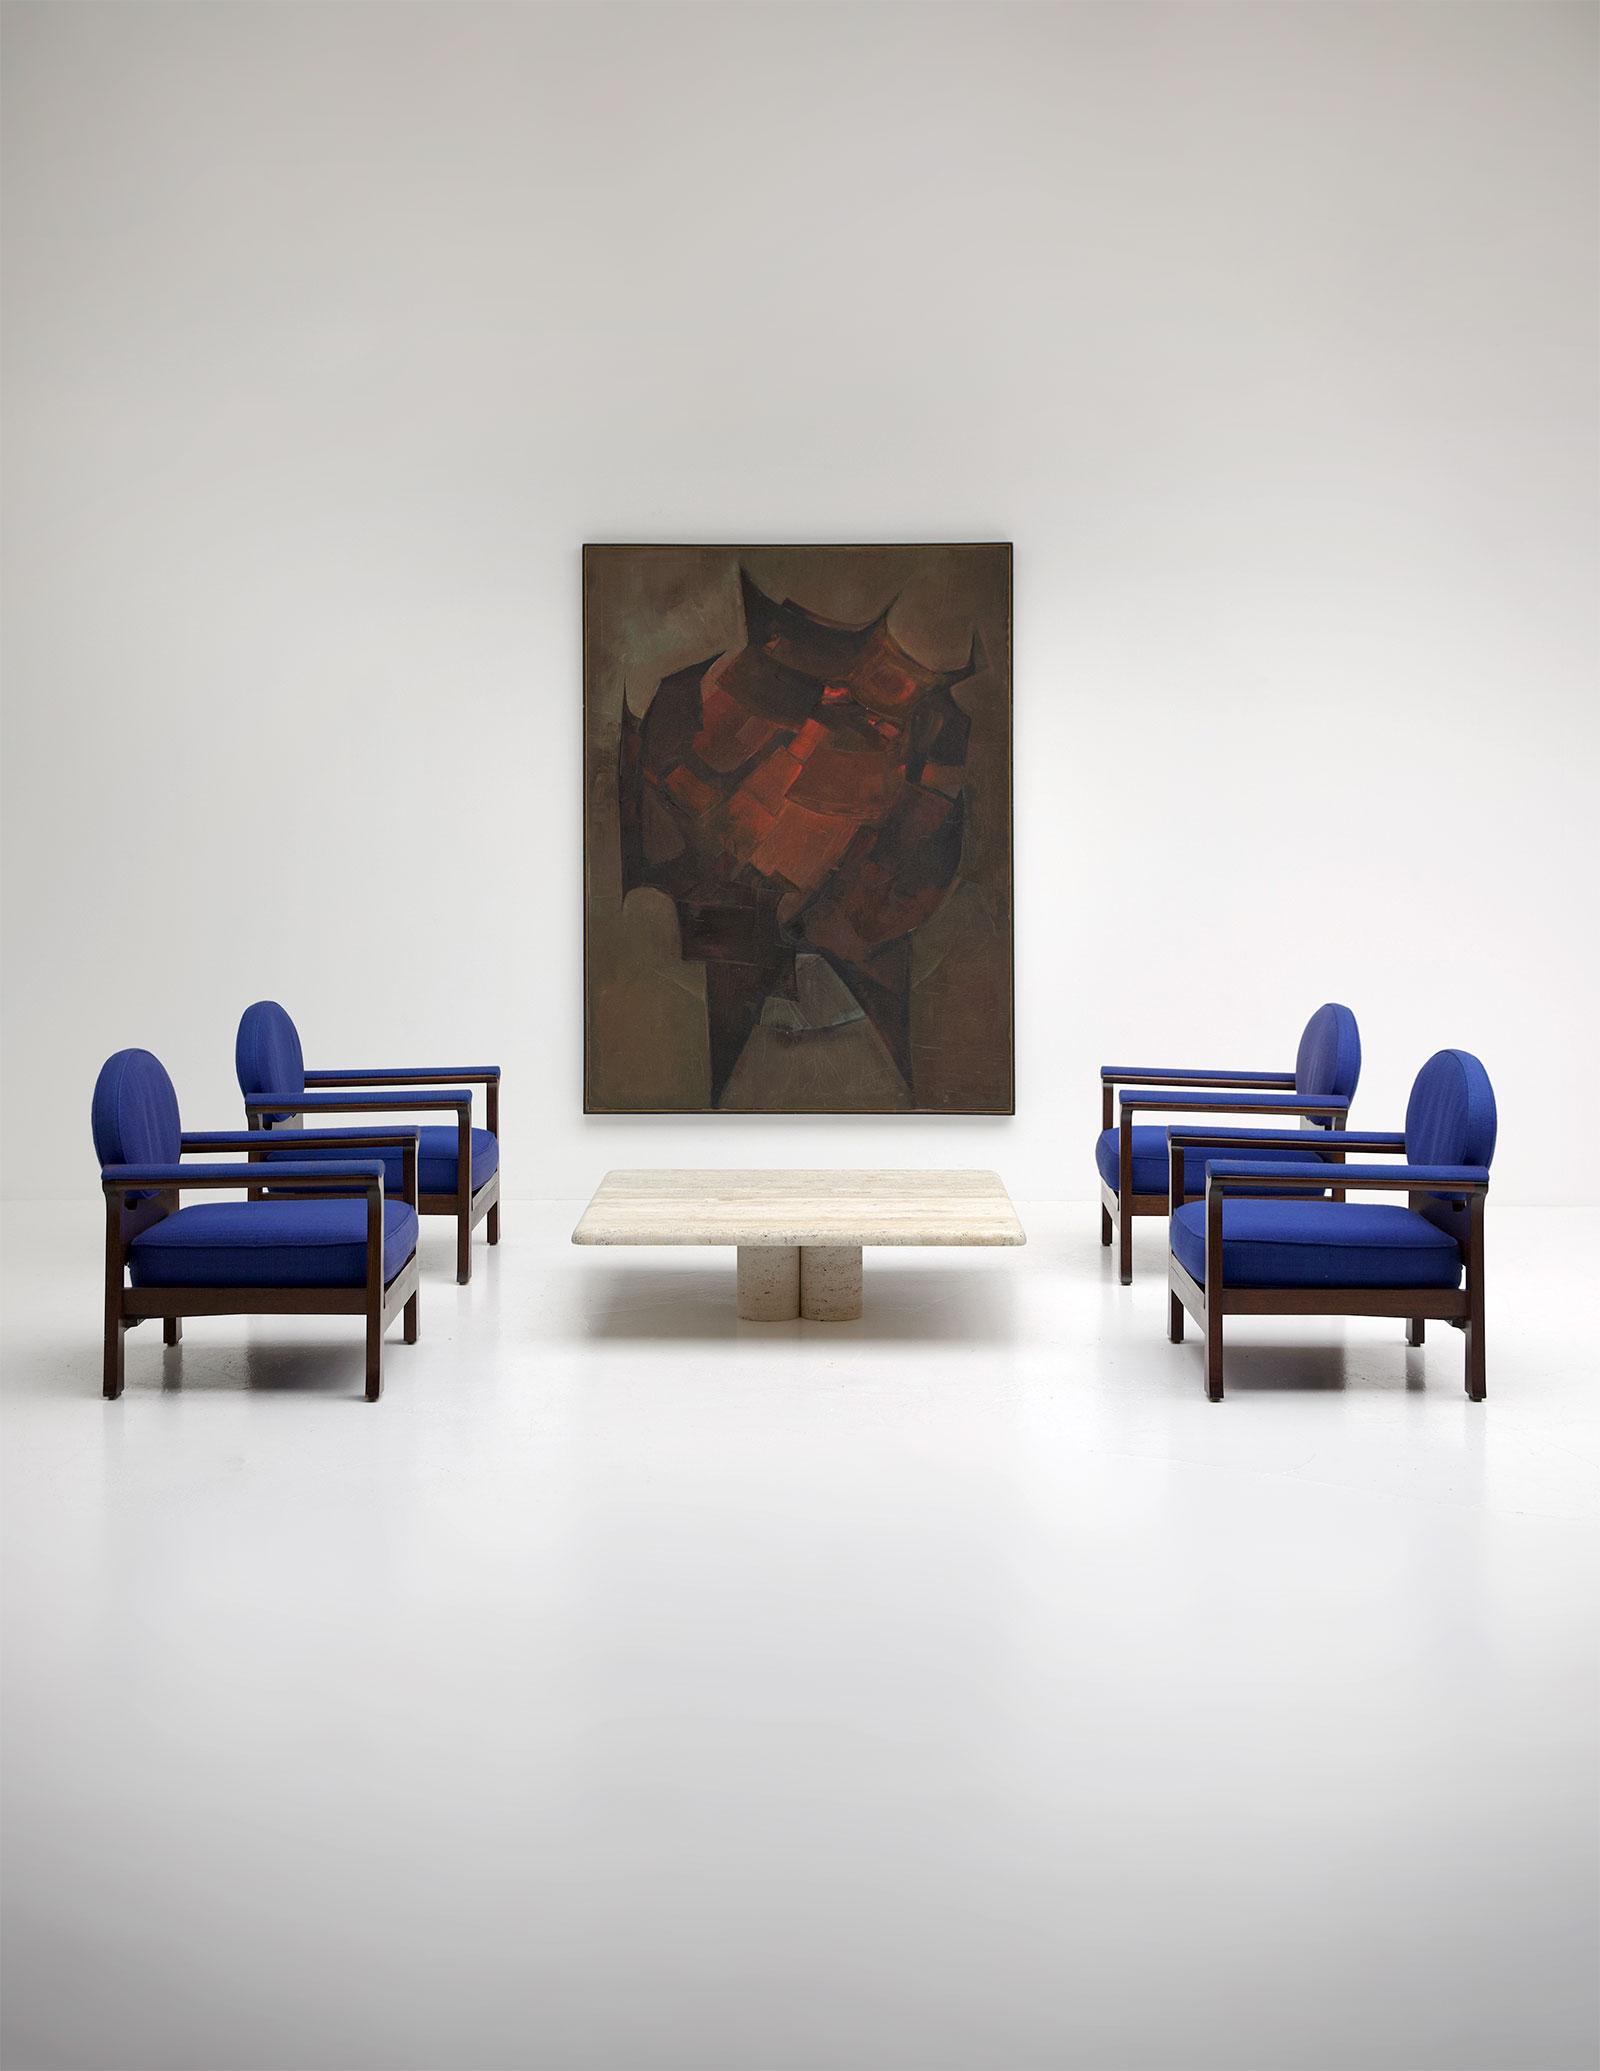 Emiel Veranneman Osaka, Chairs 1968image 1